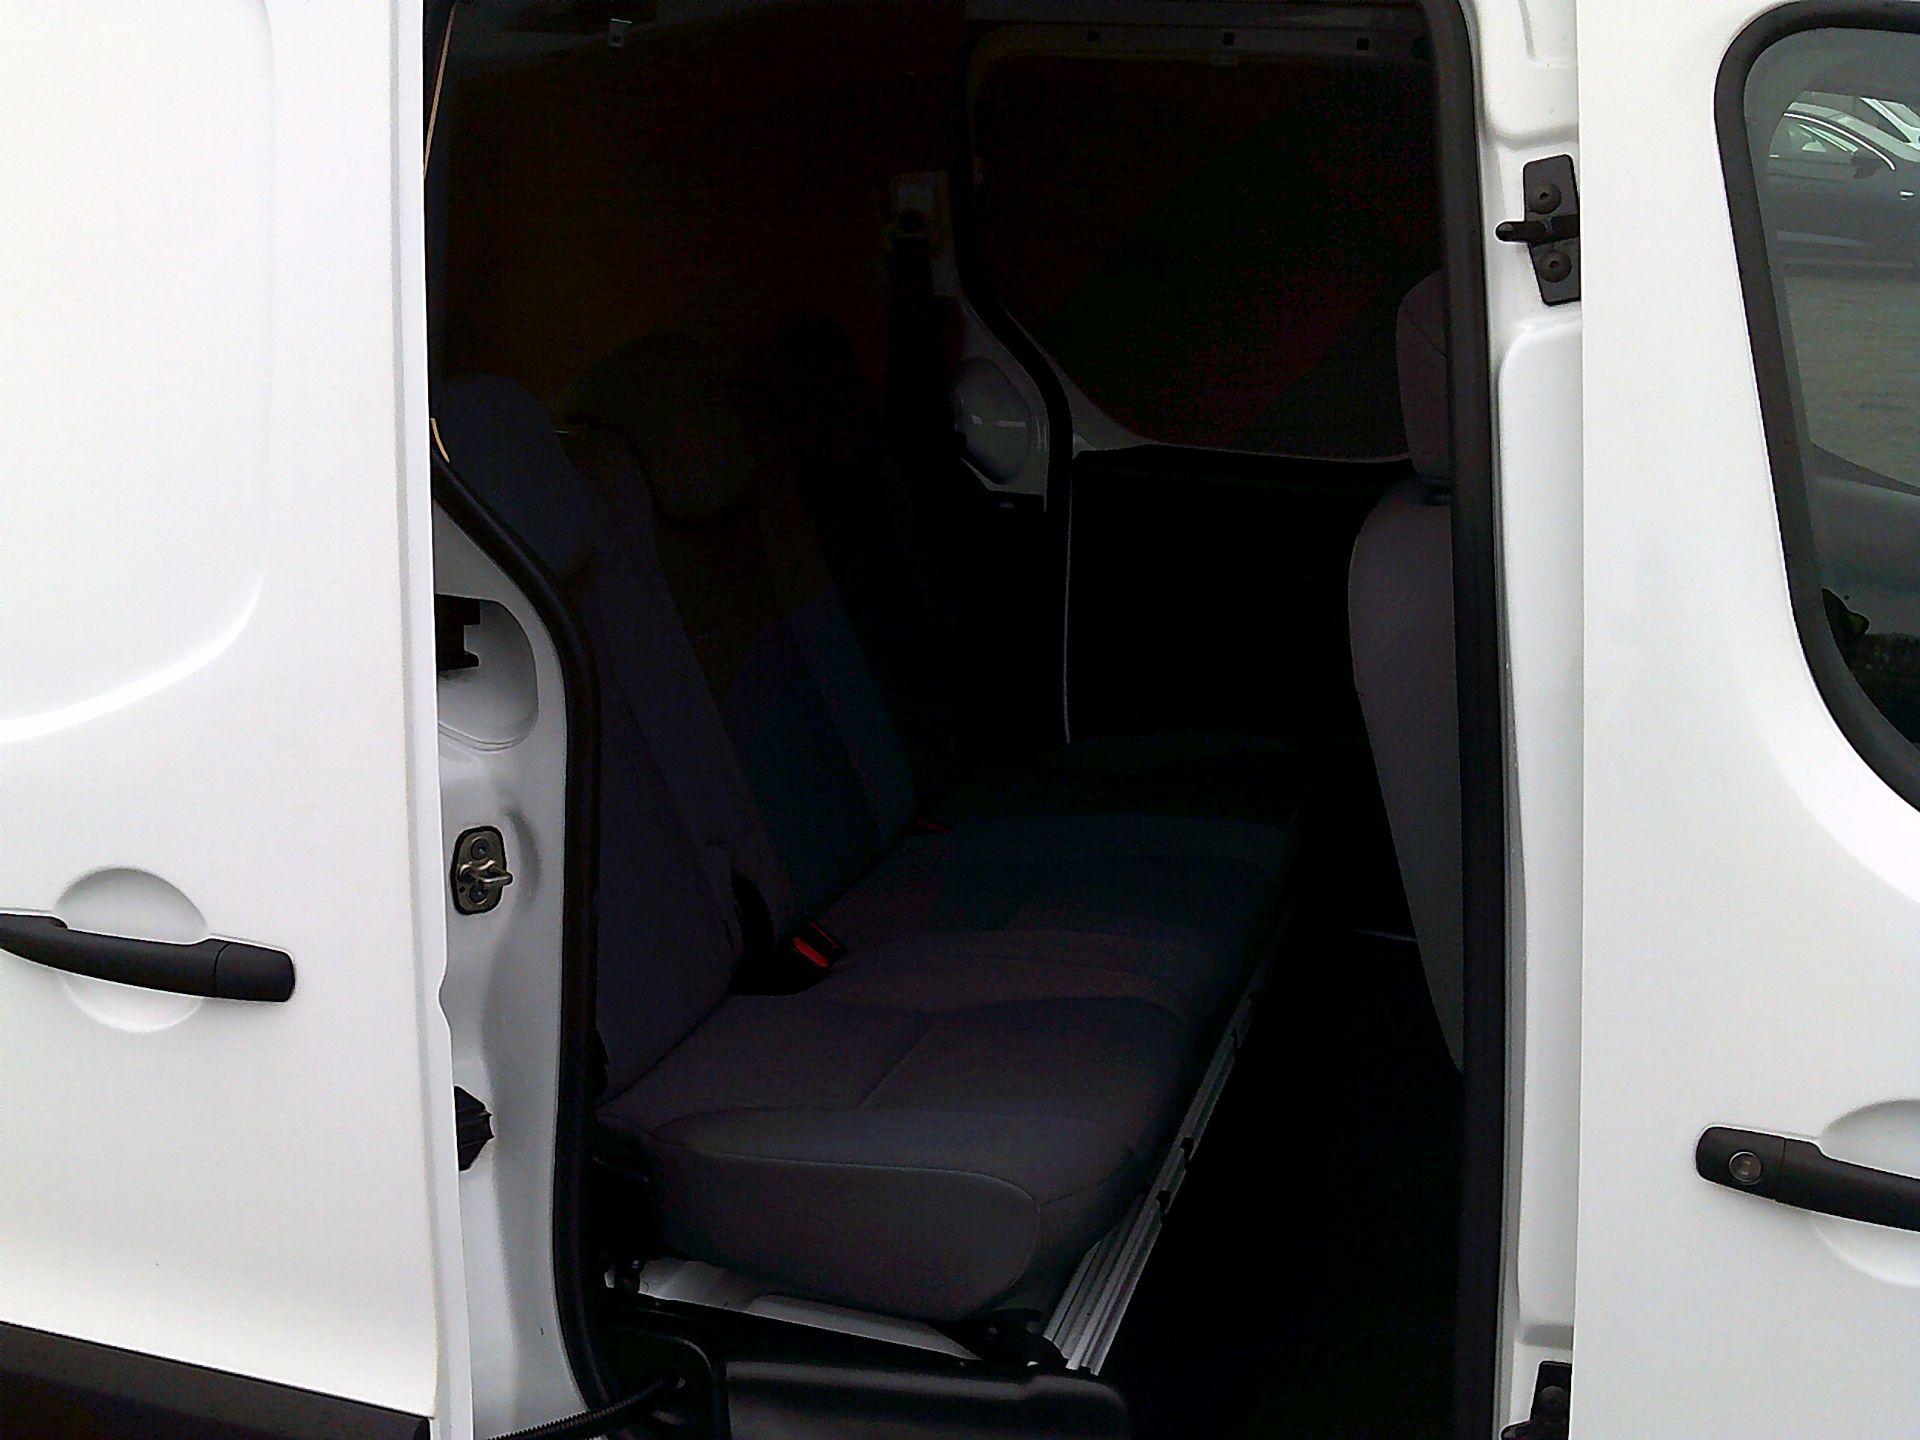 2016 Peugeot Partner L2 715 S 1.6 BLUEHDI 100 CREW VAN EURO 6 *SPEED RESTRICTED TO 56MPH* (NU66WKZ) Image 15